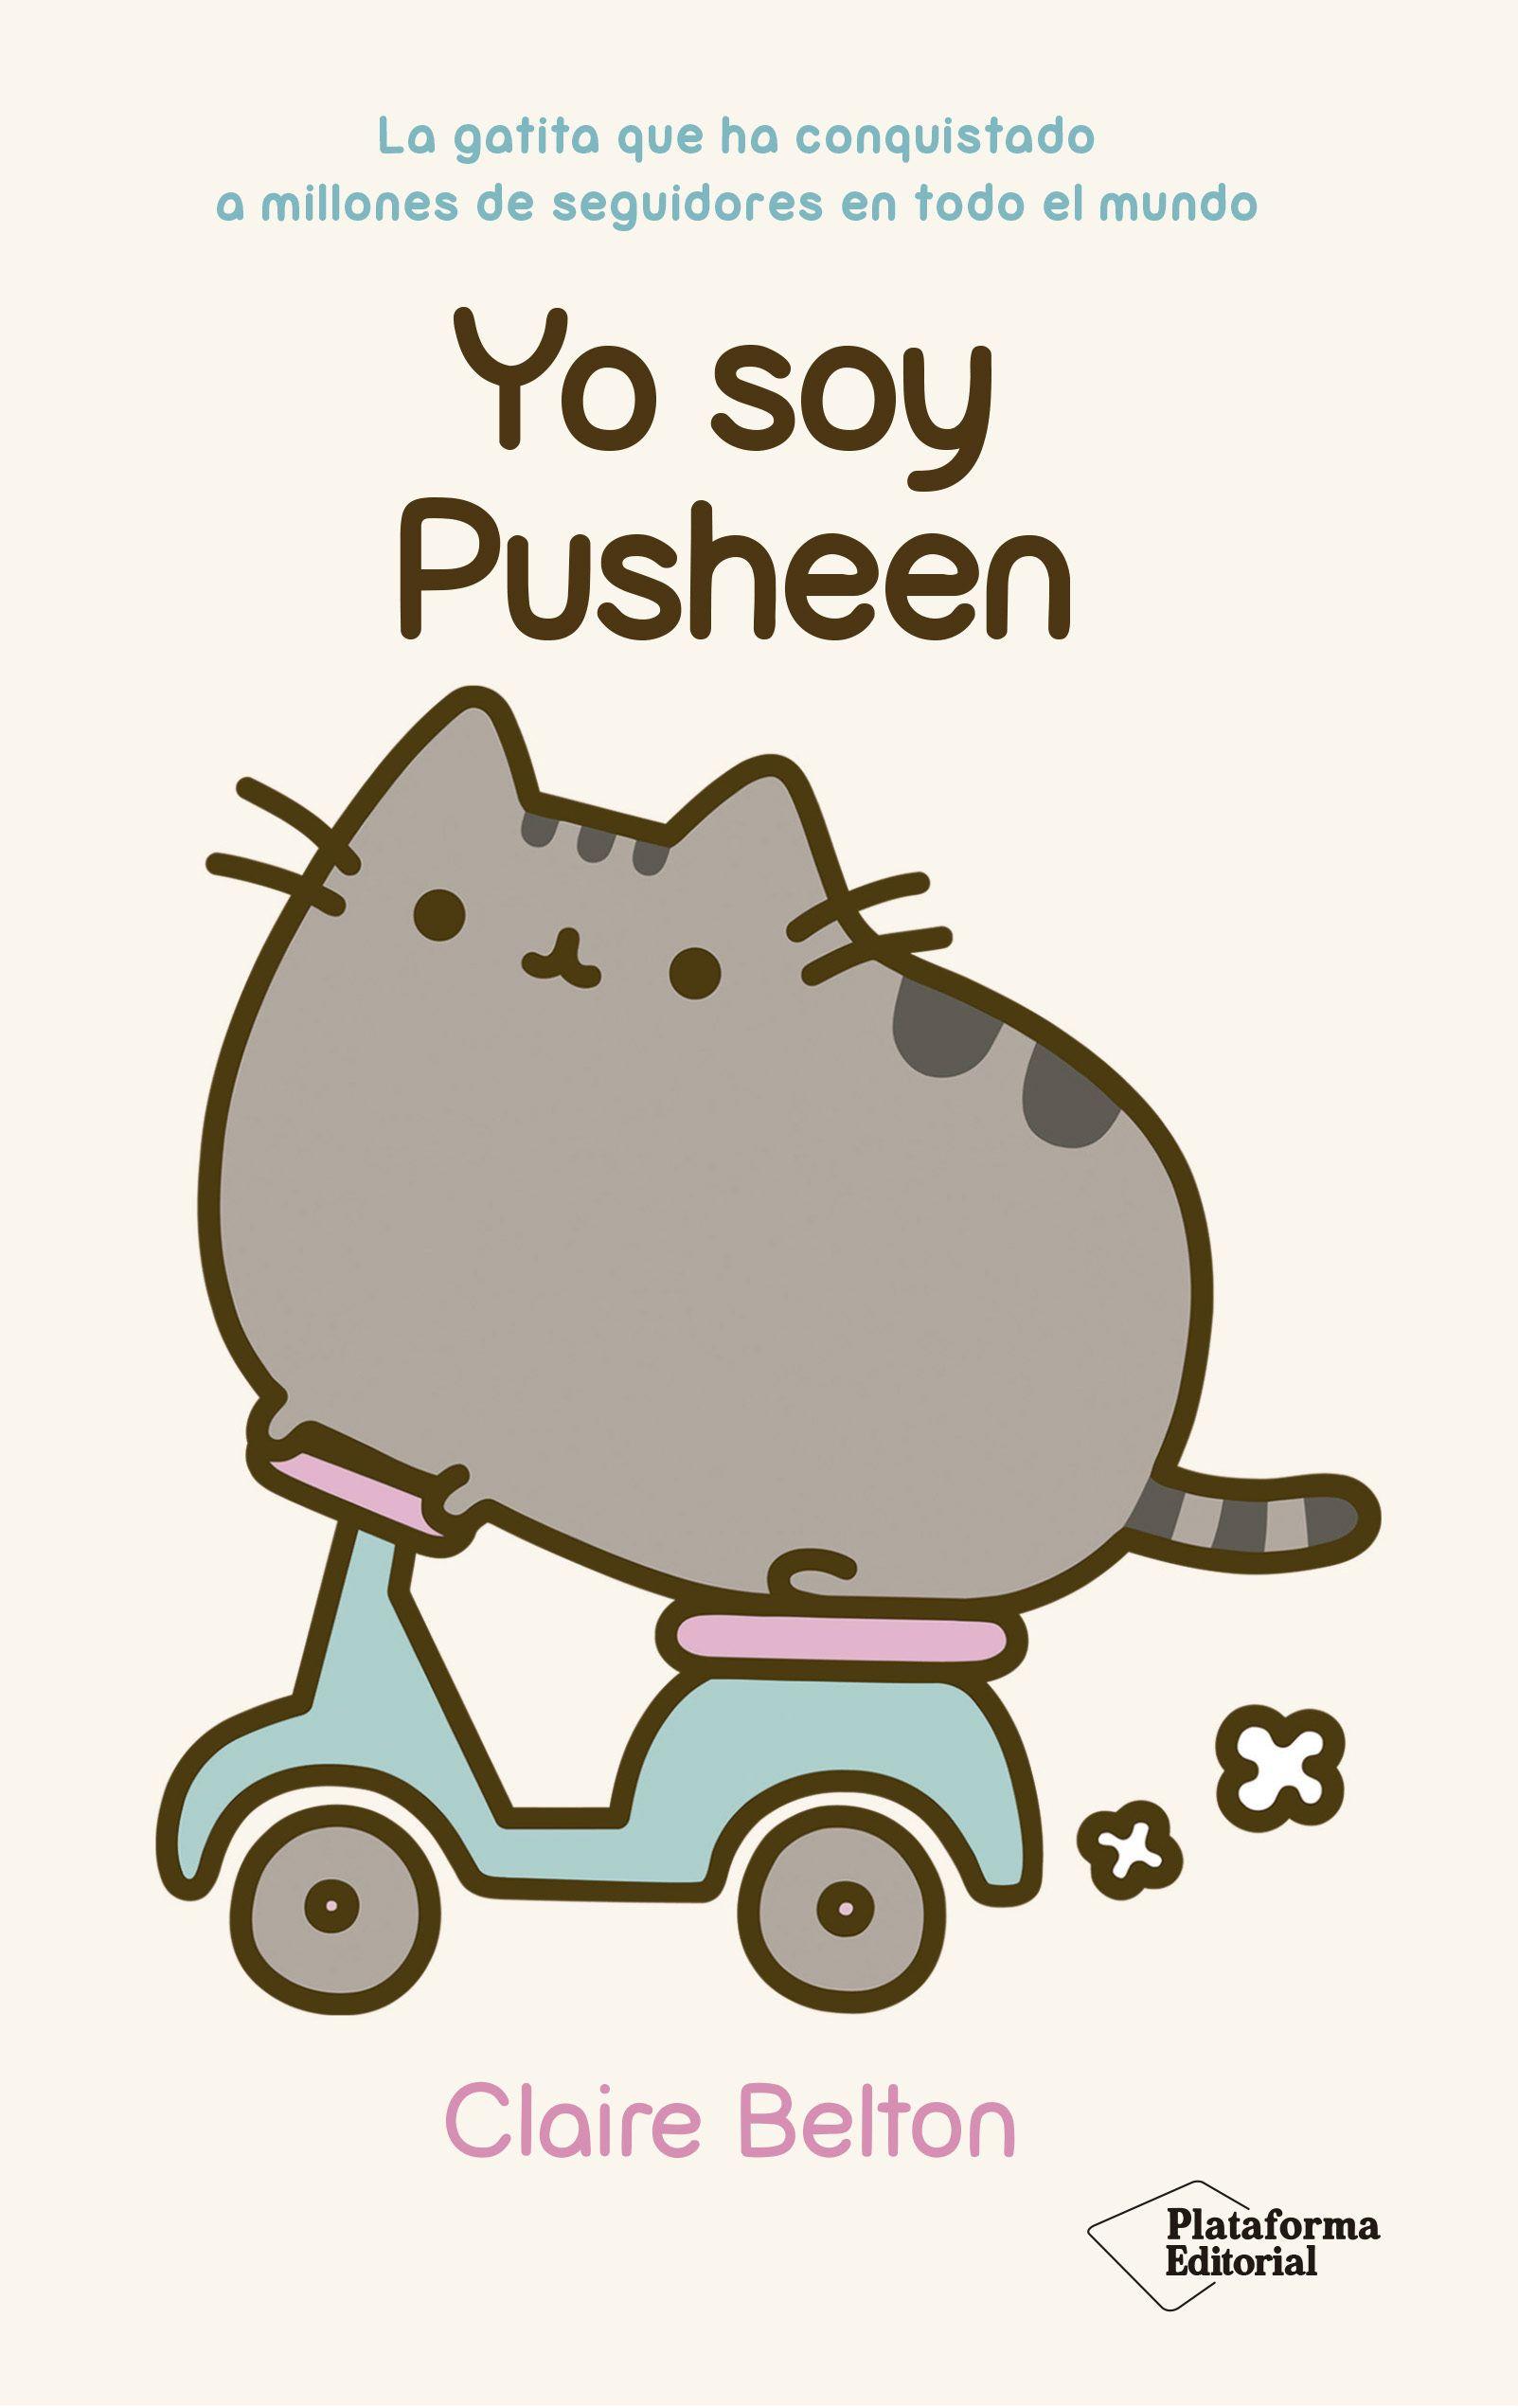 Yo Soy Pusheen Http Somoslibros Net Book Yo Soy Pusheen Pusheen Peluche De Pusheen Imagenes De Pusheen